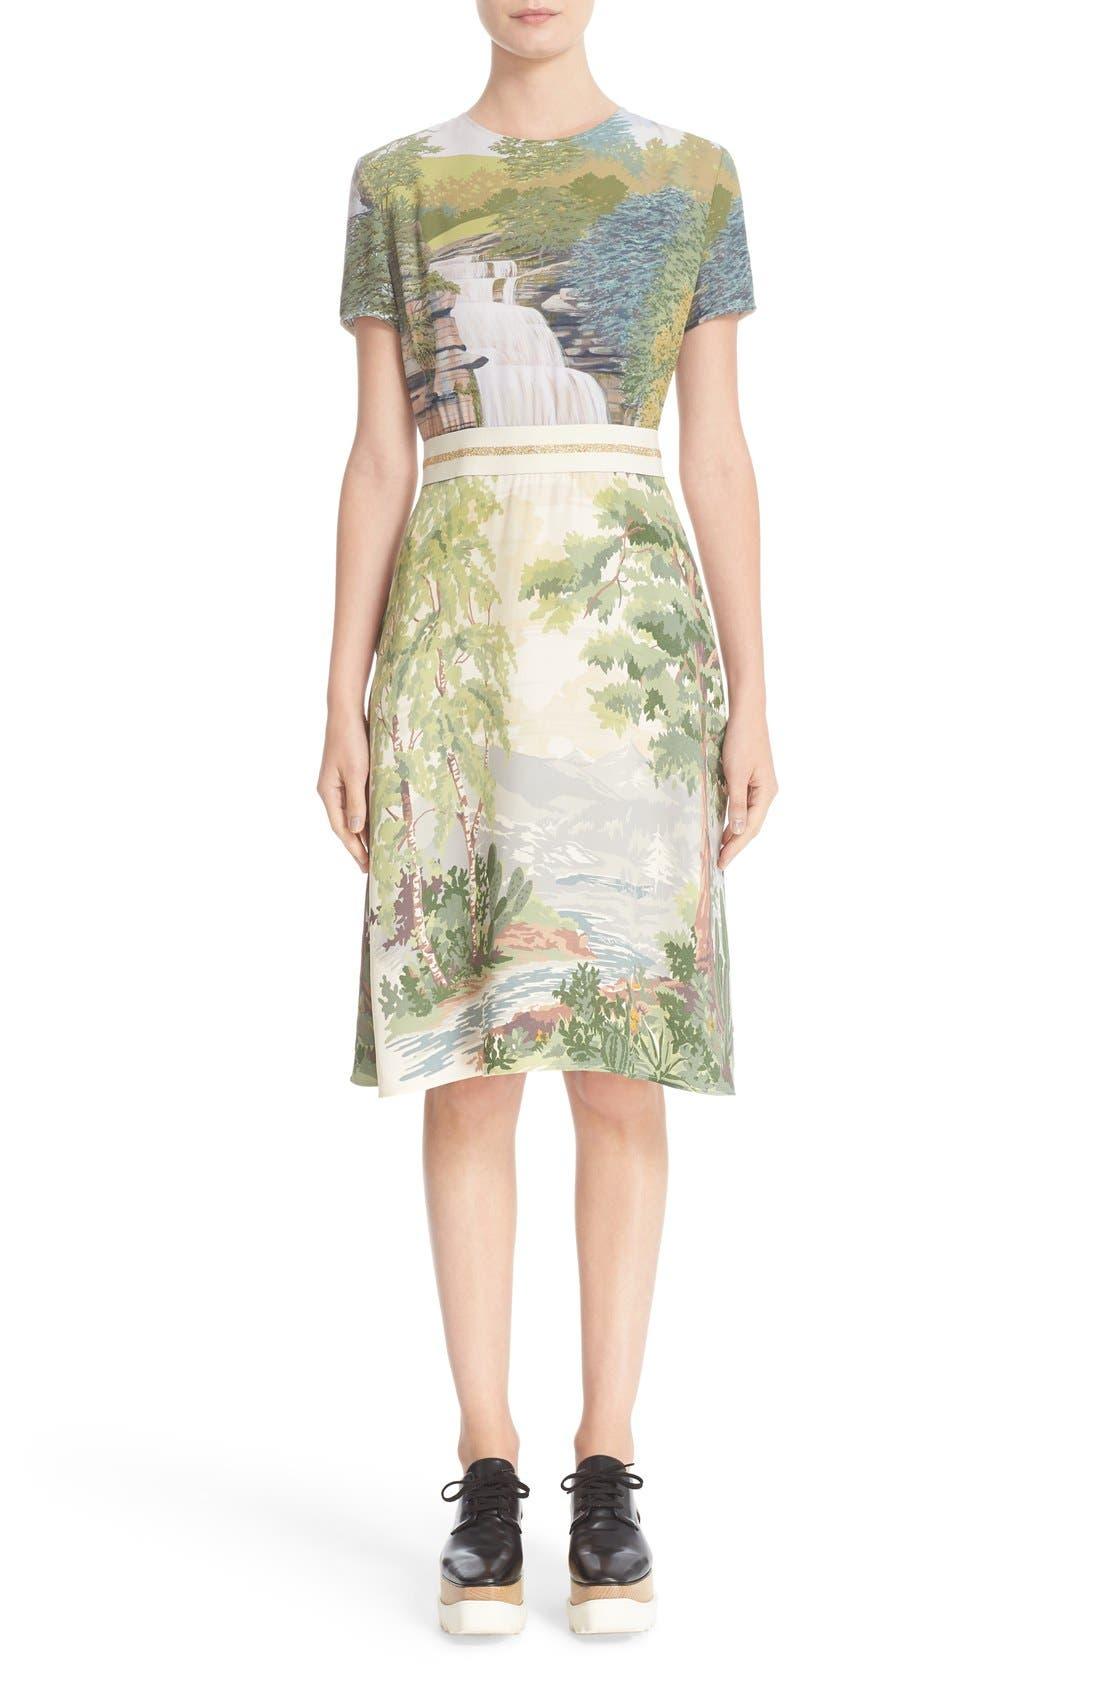 STELLA MCCARTNEY Landscape Print Dress